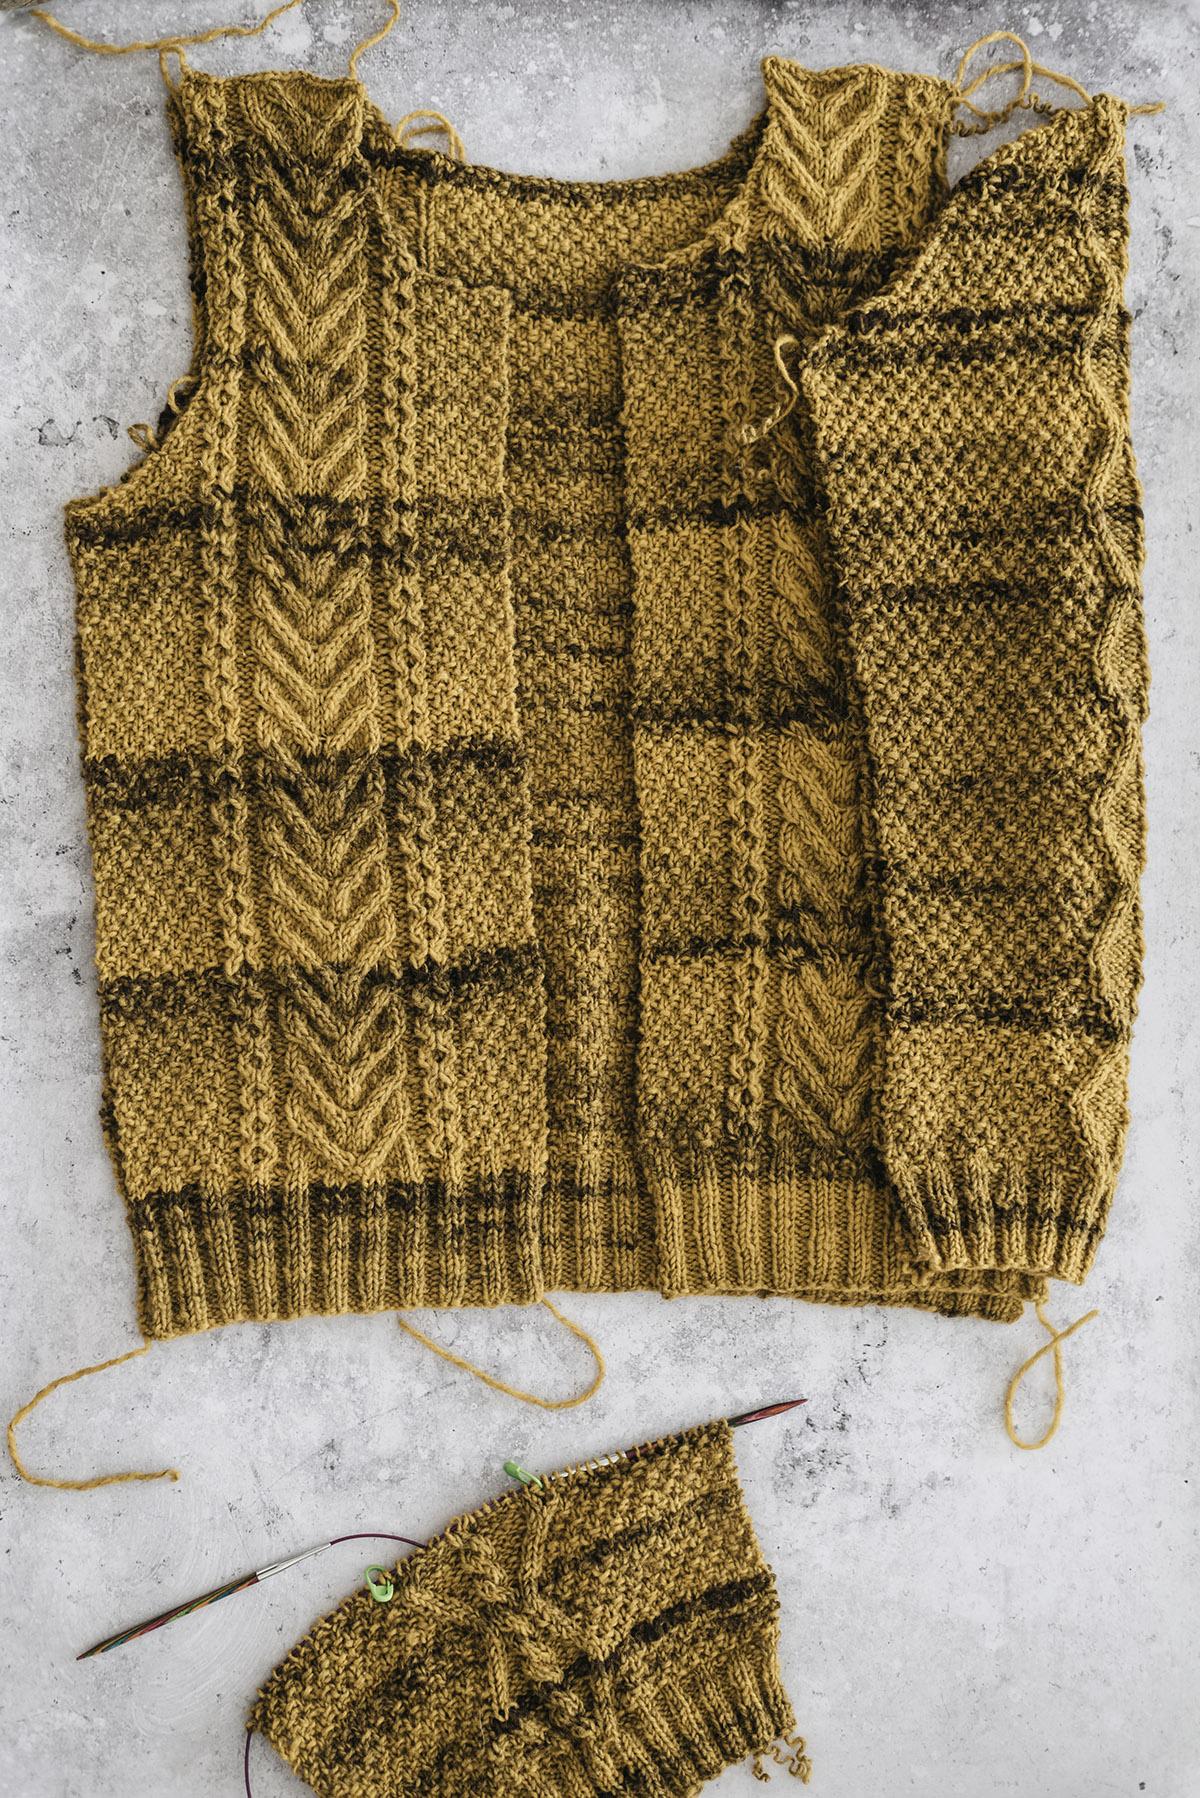 wip-knitting-flat-aran-cardigan-japanese-book-beiroa-rosa-pomar-patricia-martins-yellowish-2019